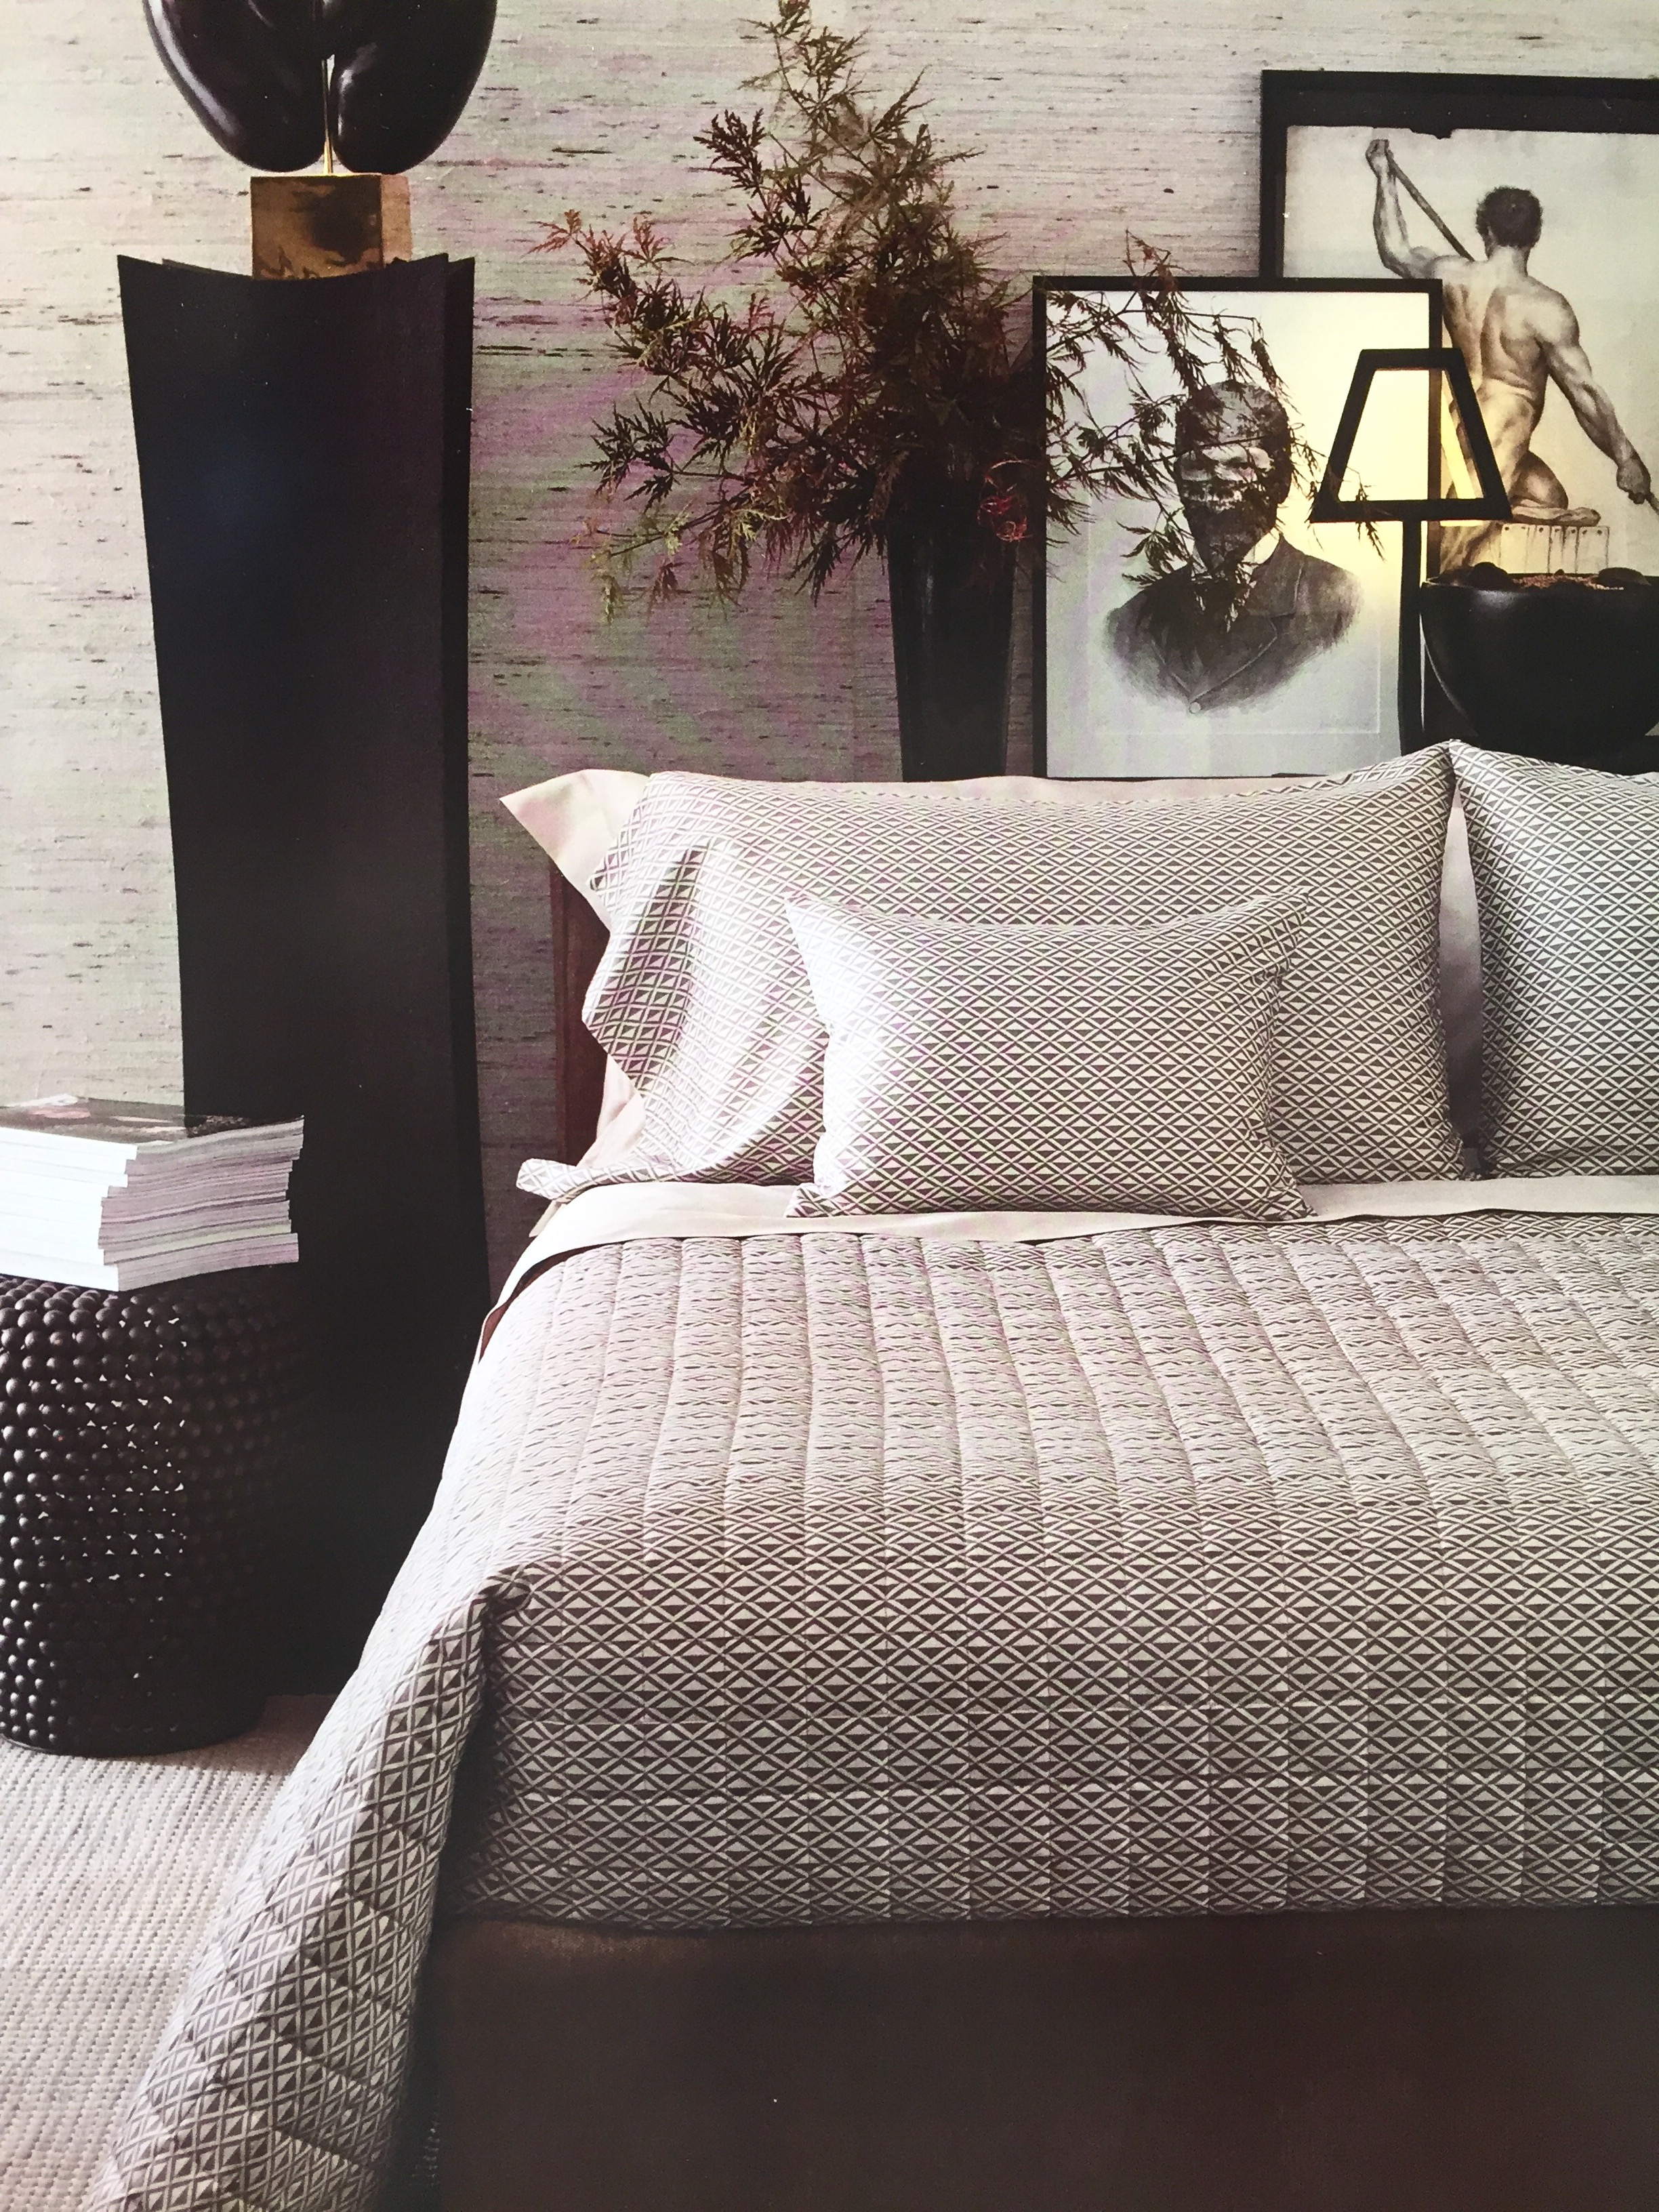 Maison&Objet 2016 September edition - Blumarine contemporary Art Deco in bed linen | Masha Shapiro Agency.jpg